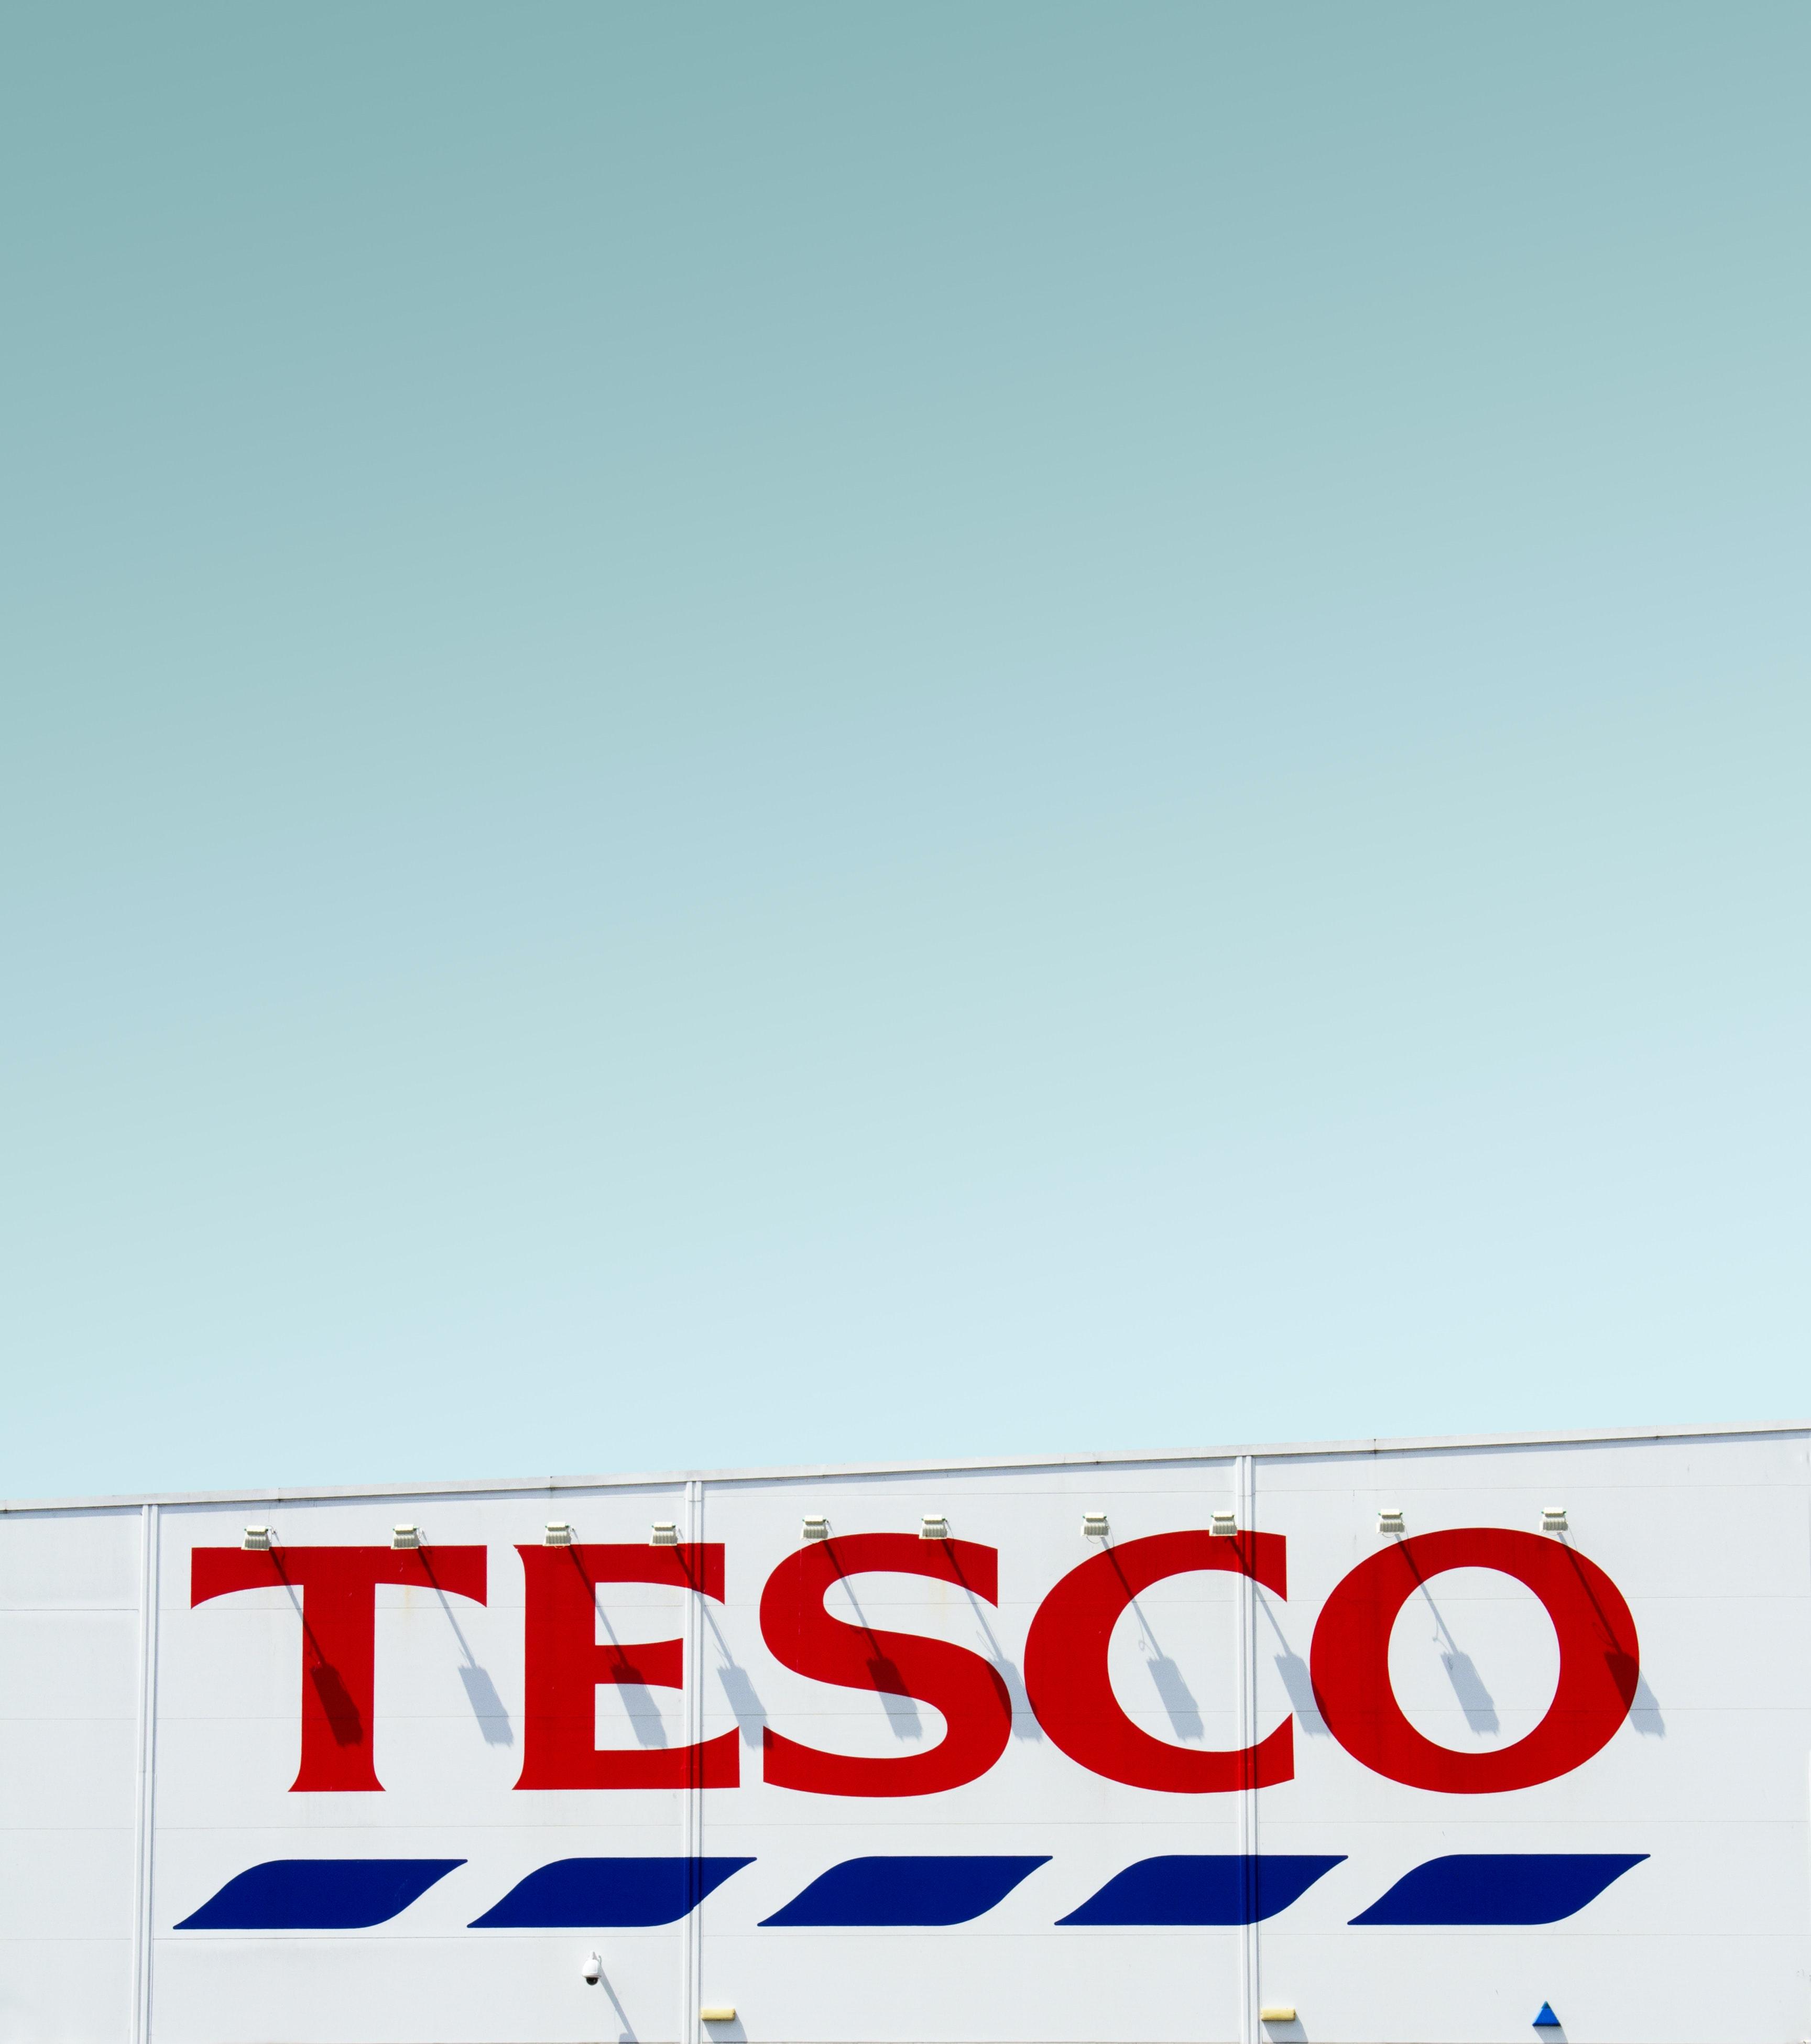 #1 June Update: Tesco Town, LEGO Buildings, £30m Gov Framework, Crossrail Delayed